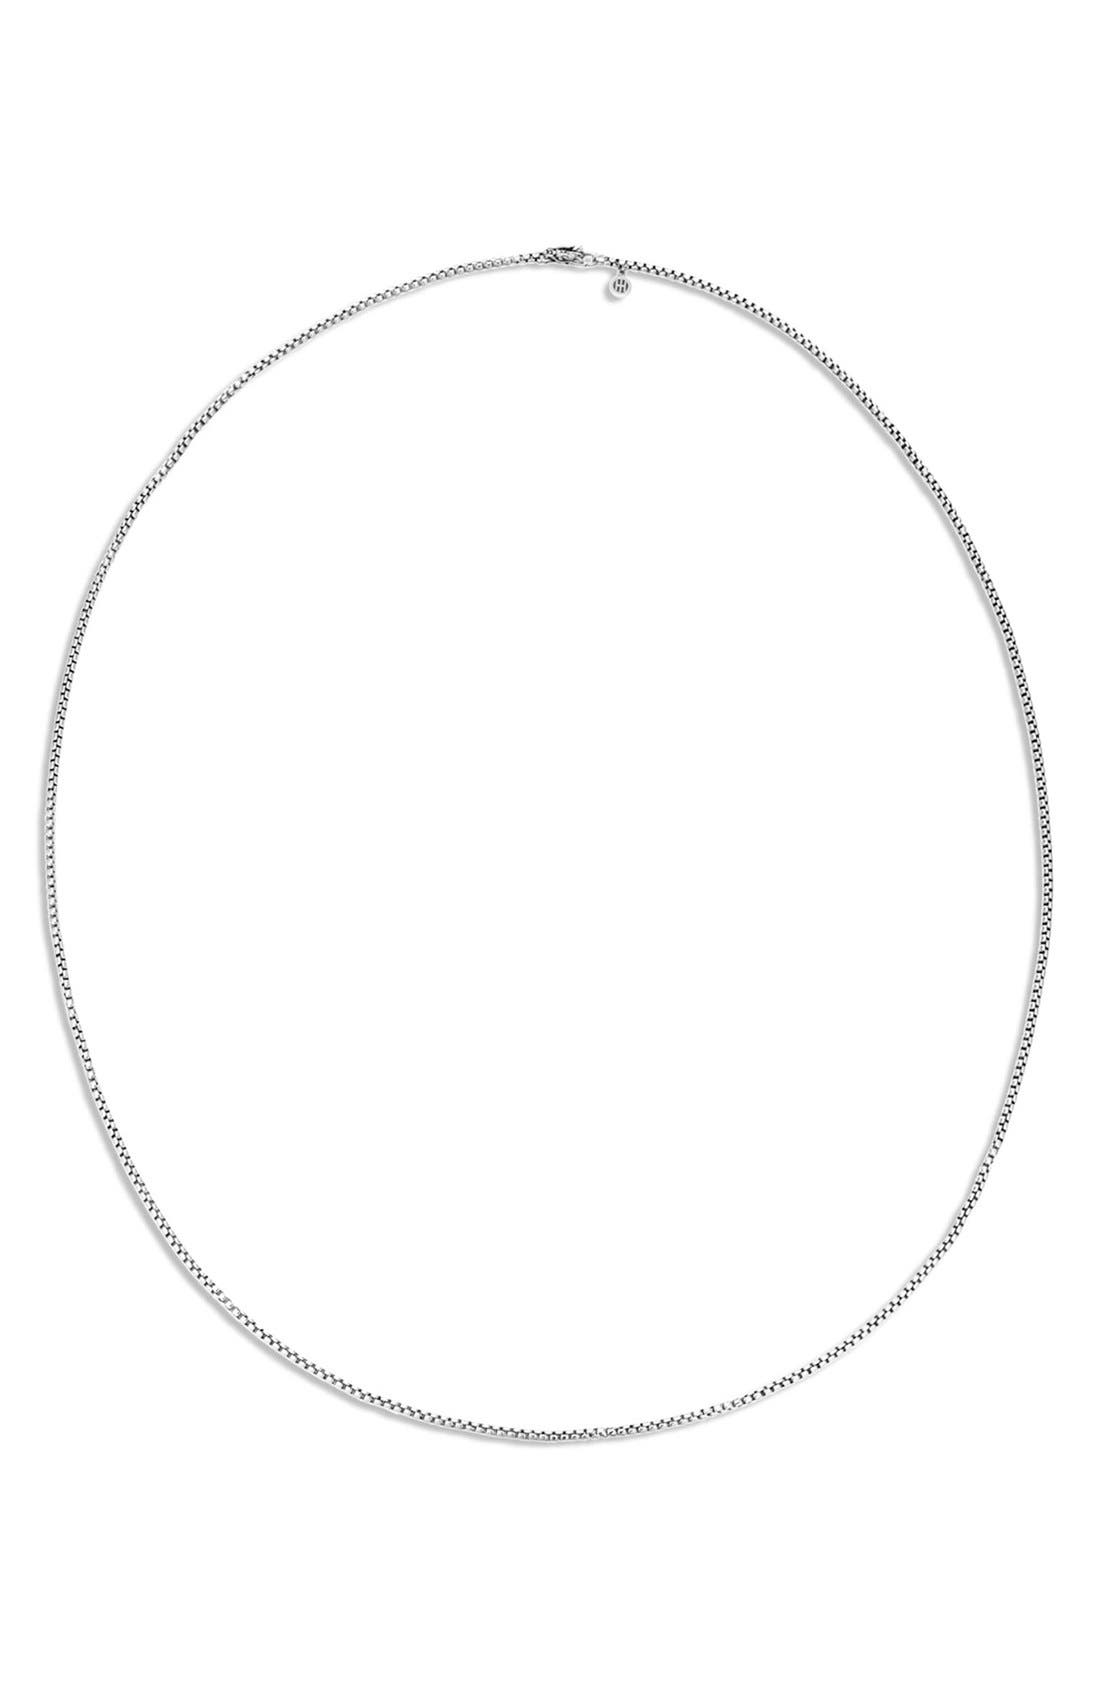 John Hardy 'Legends' Box Chain Necklace